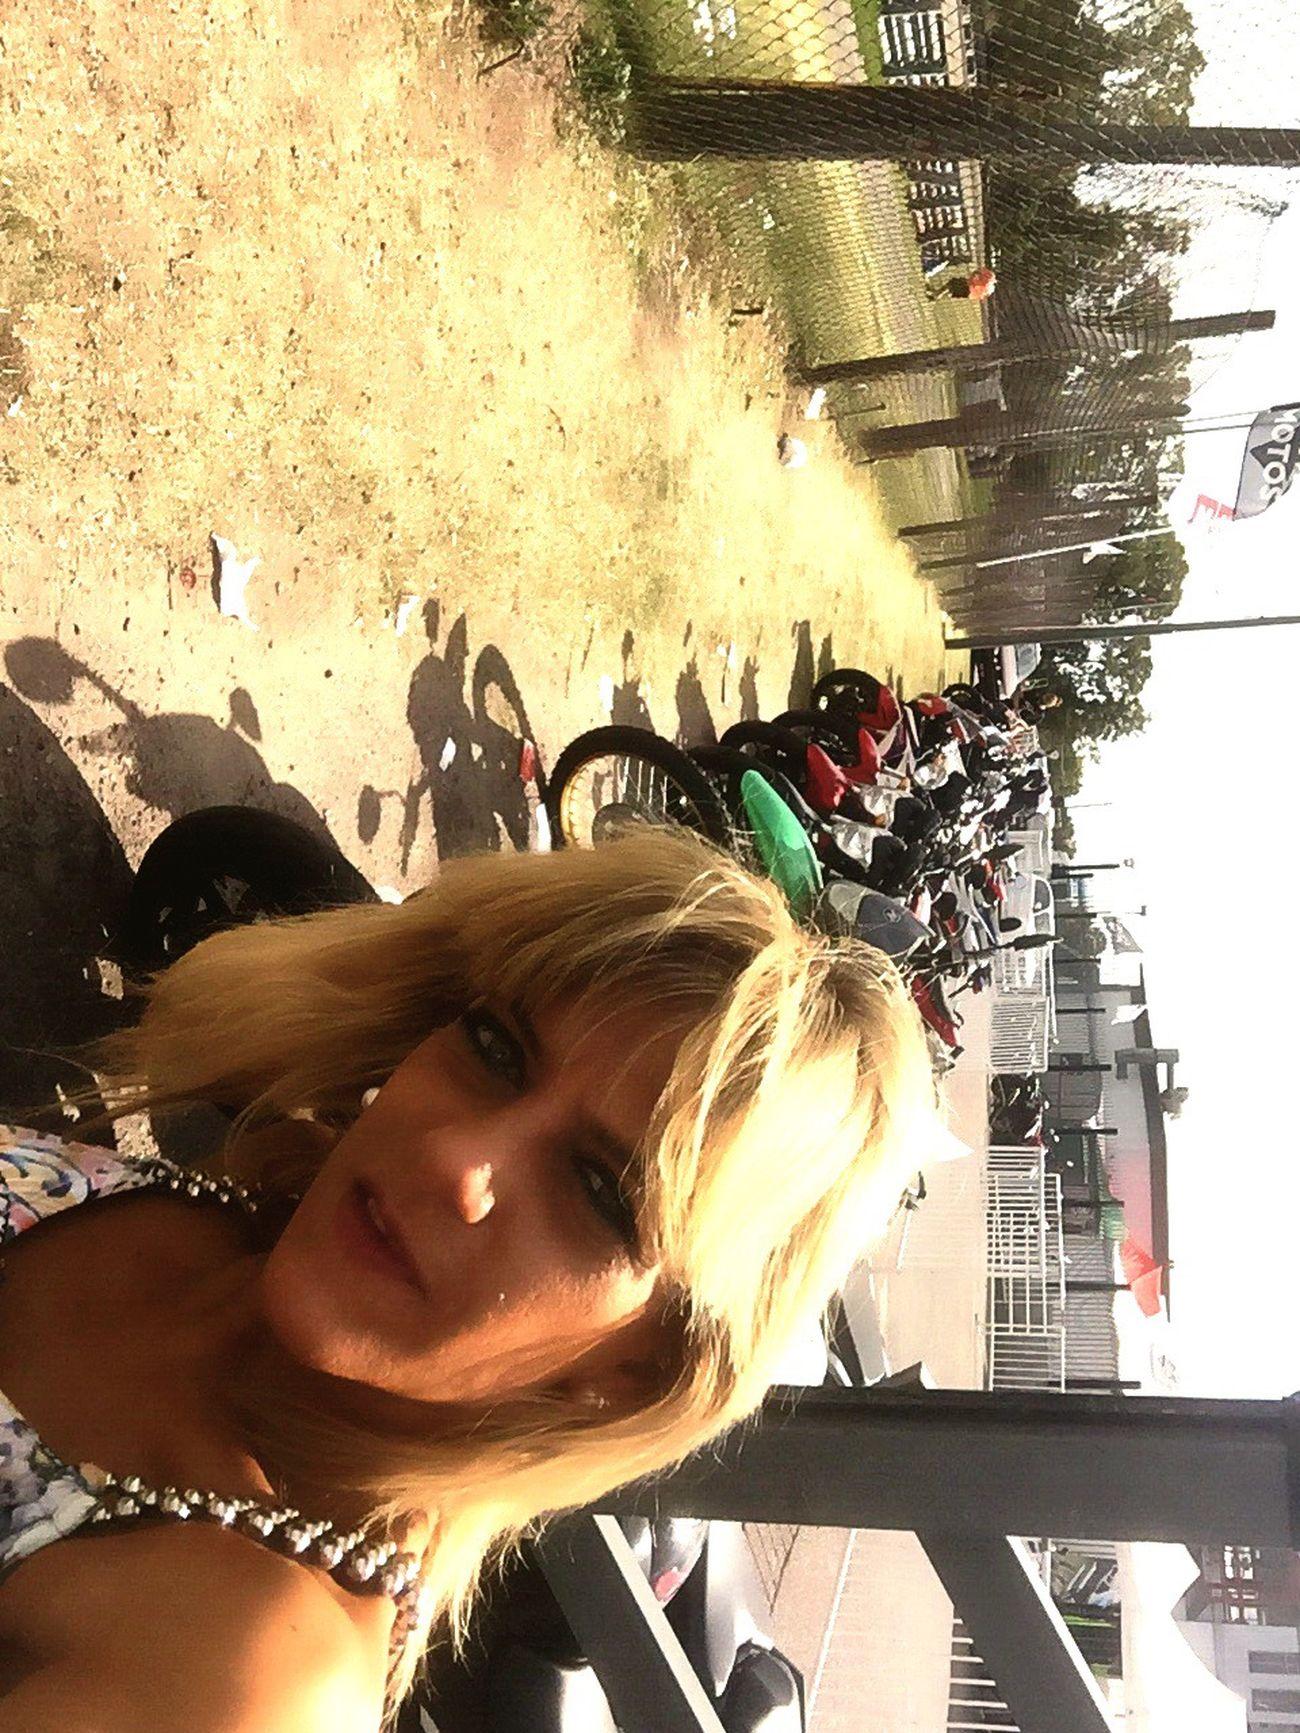 Enjoying Life Autodromo Galvez Motogp2015 8.11.15 Buenosaires